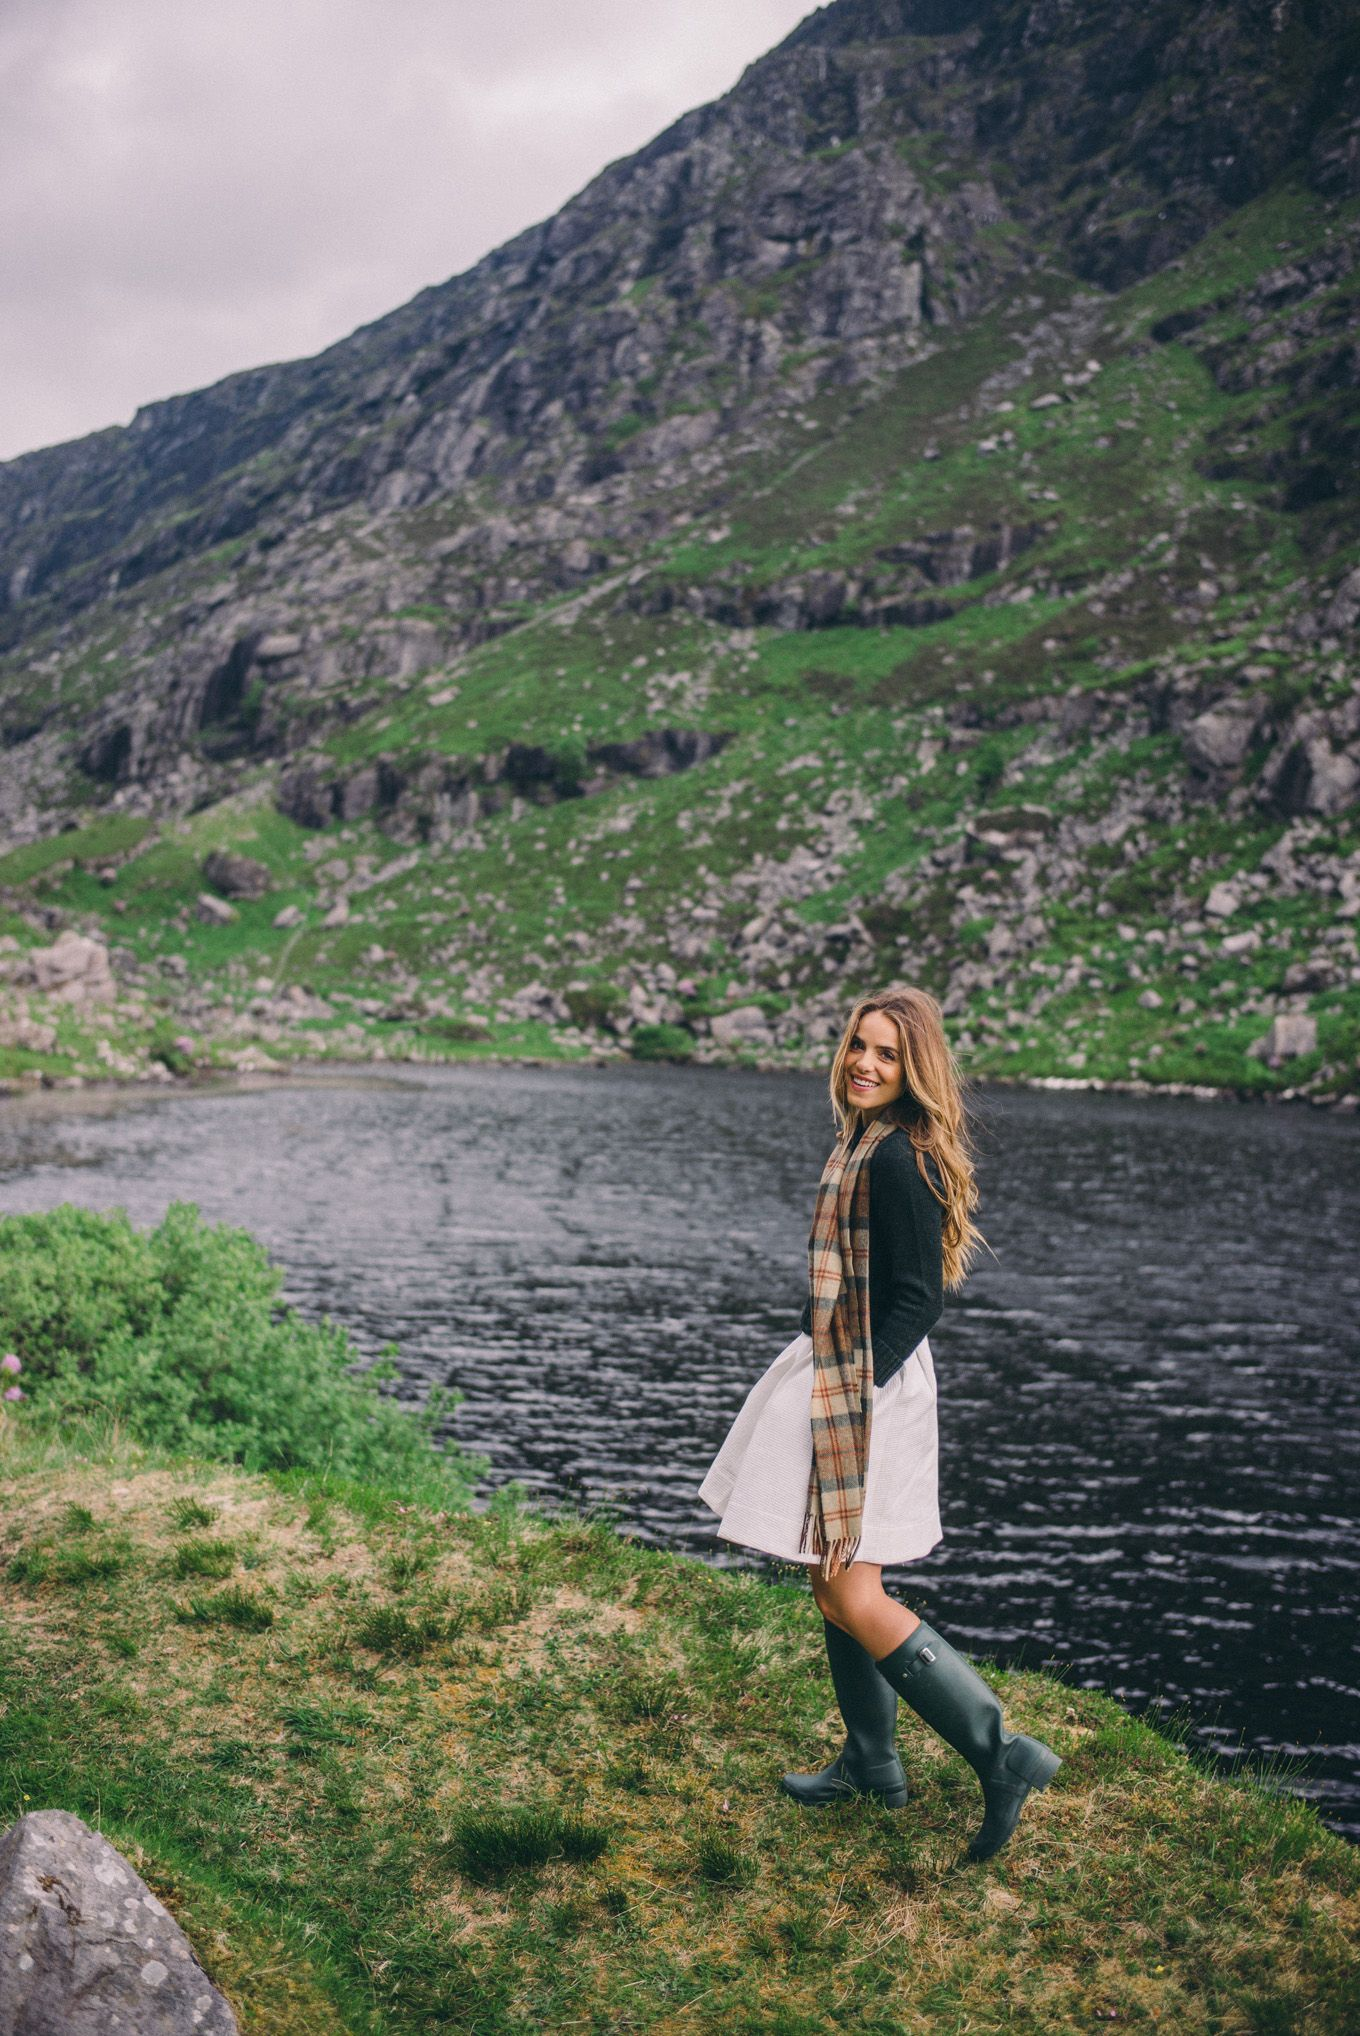 I Moda Of Like What Dingle Dunloe Pinterest Faldas Gap Y amp; S8dTxXqq